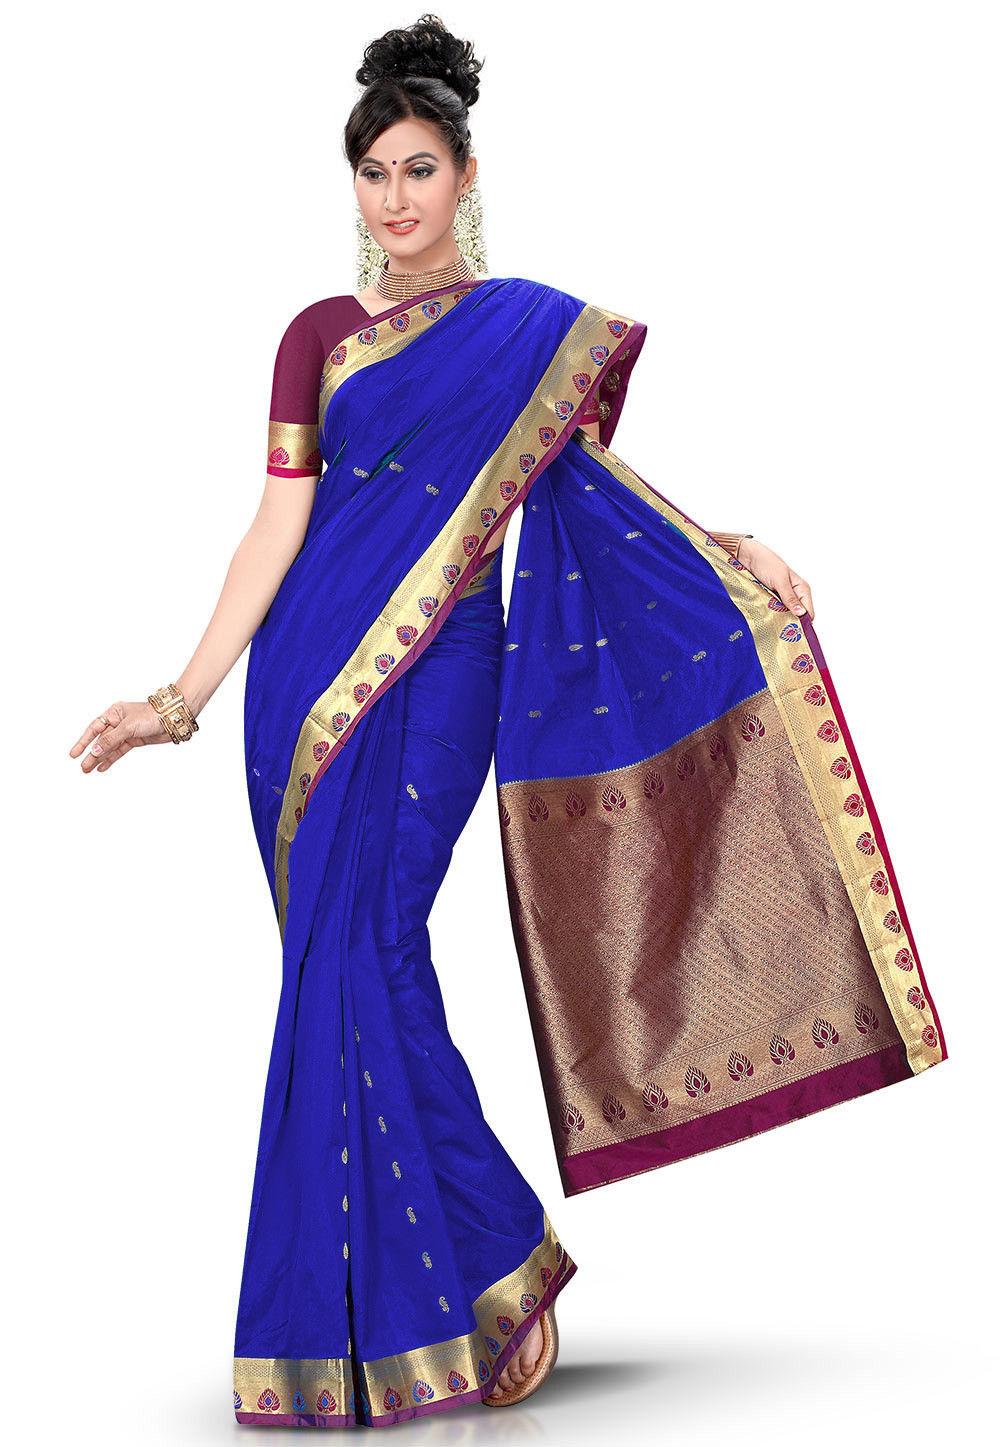 Woven Kanchipuram Saree in Blue